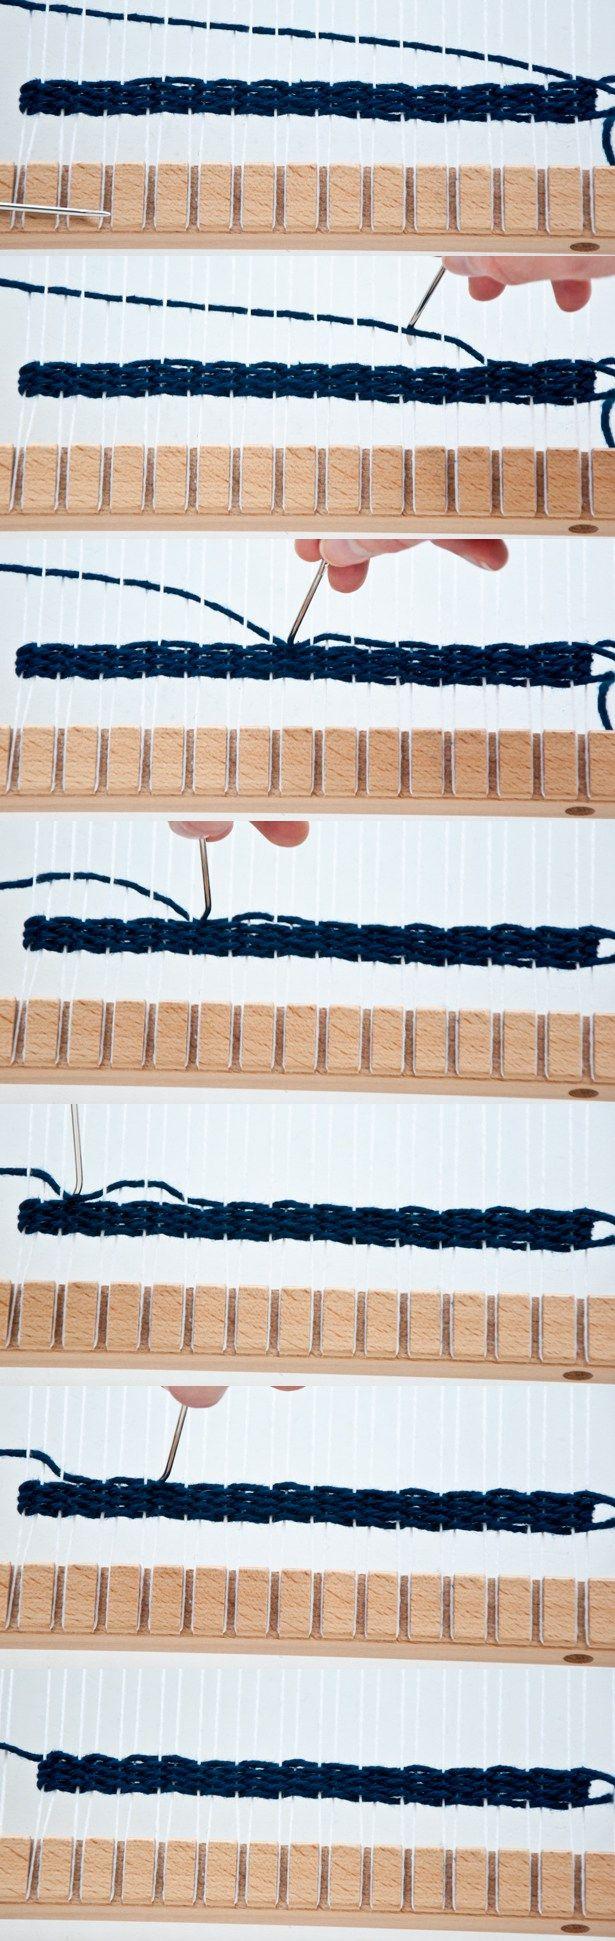 Plain Weave Tip |The Weaving Loom